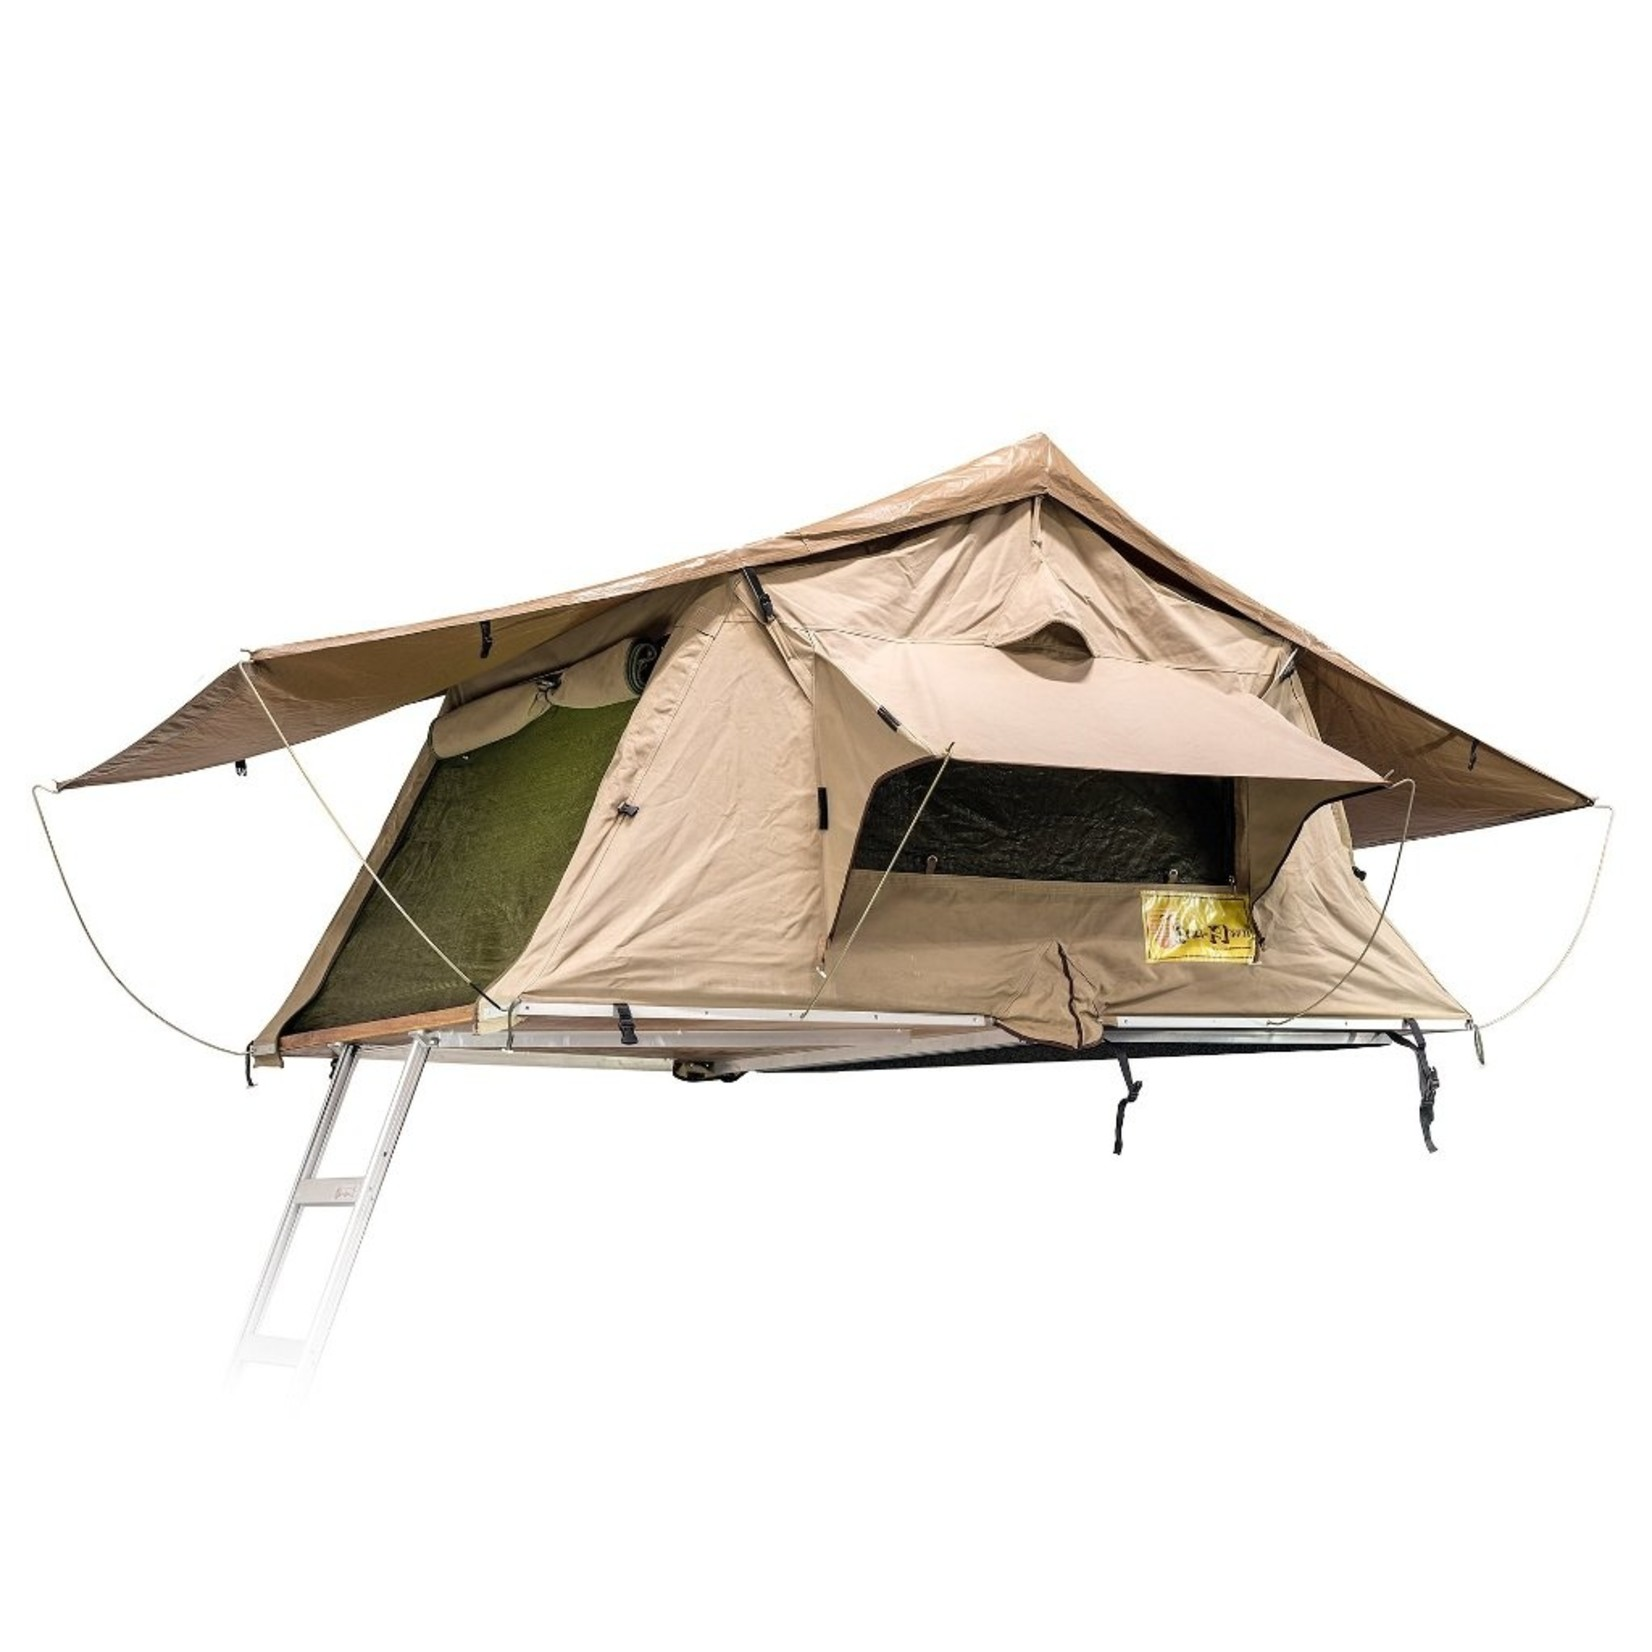 Eezi-Awn Eezi-Awn Series III Roof Top Tent